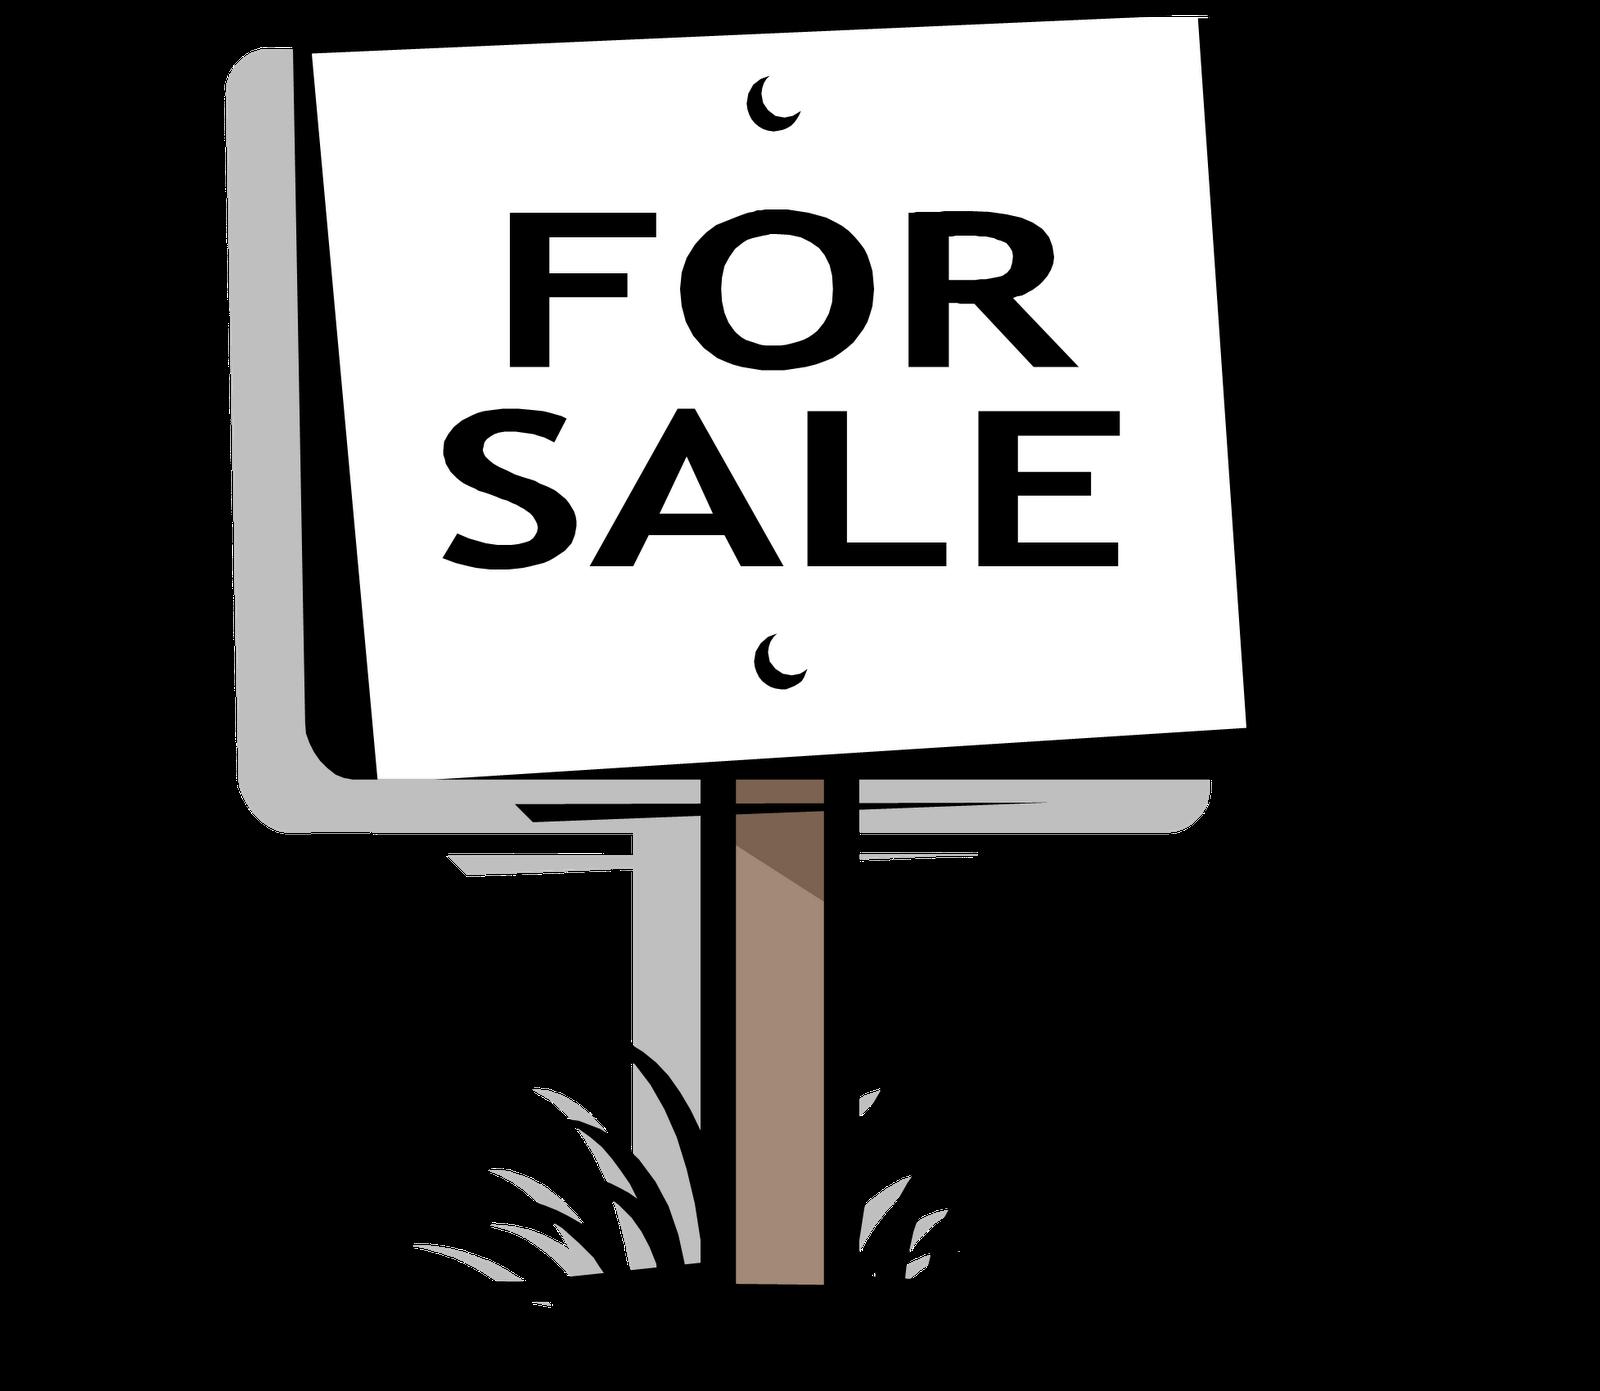 For Sale Sign Template-For Sale Sign Template-9